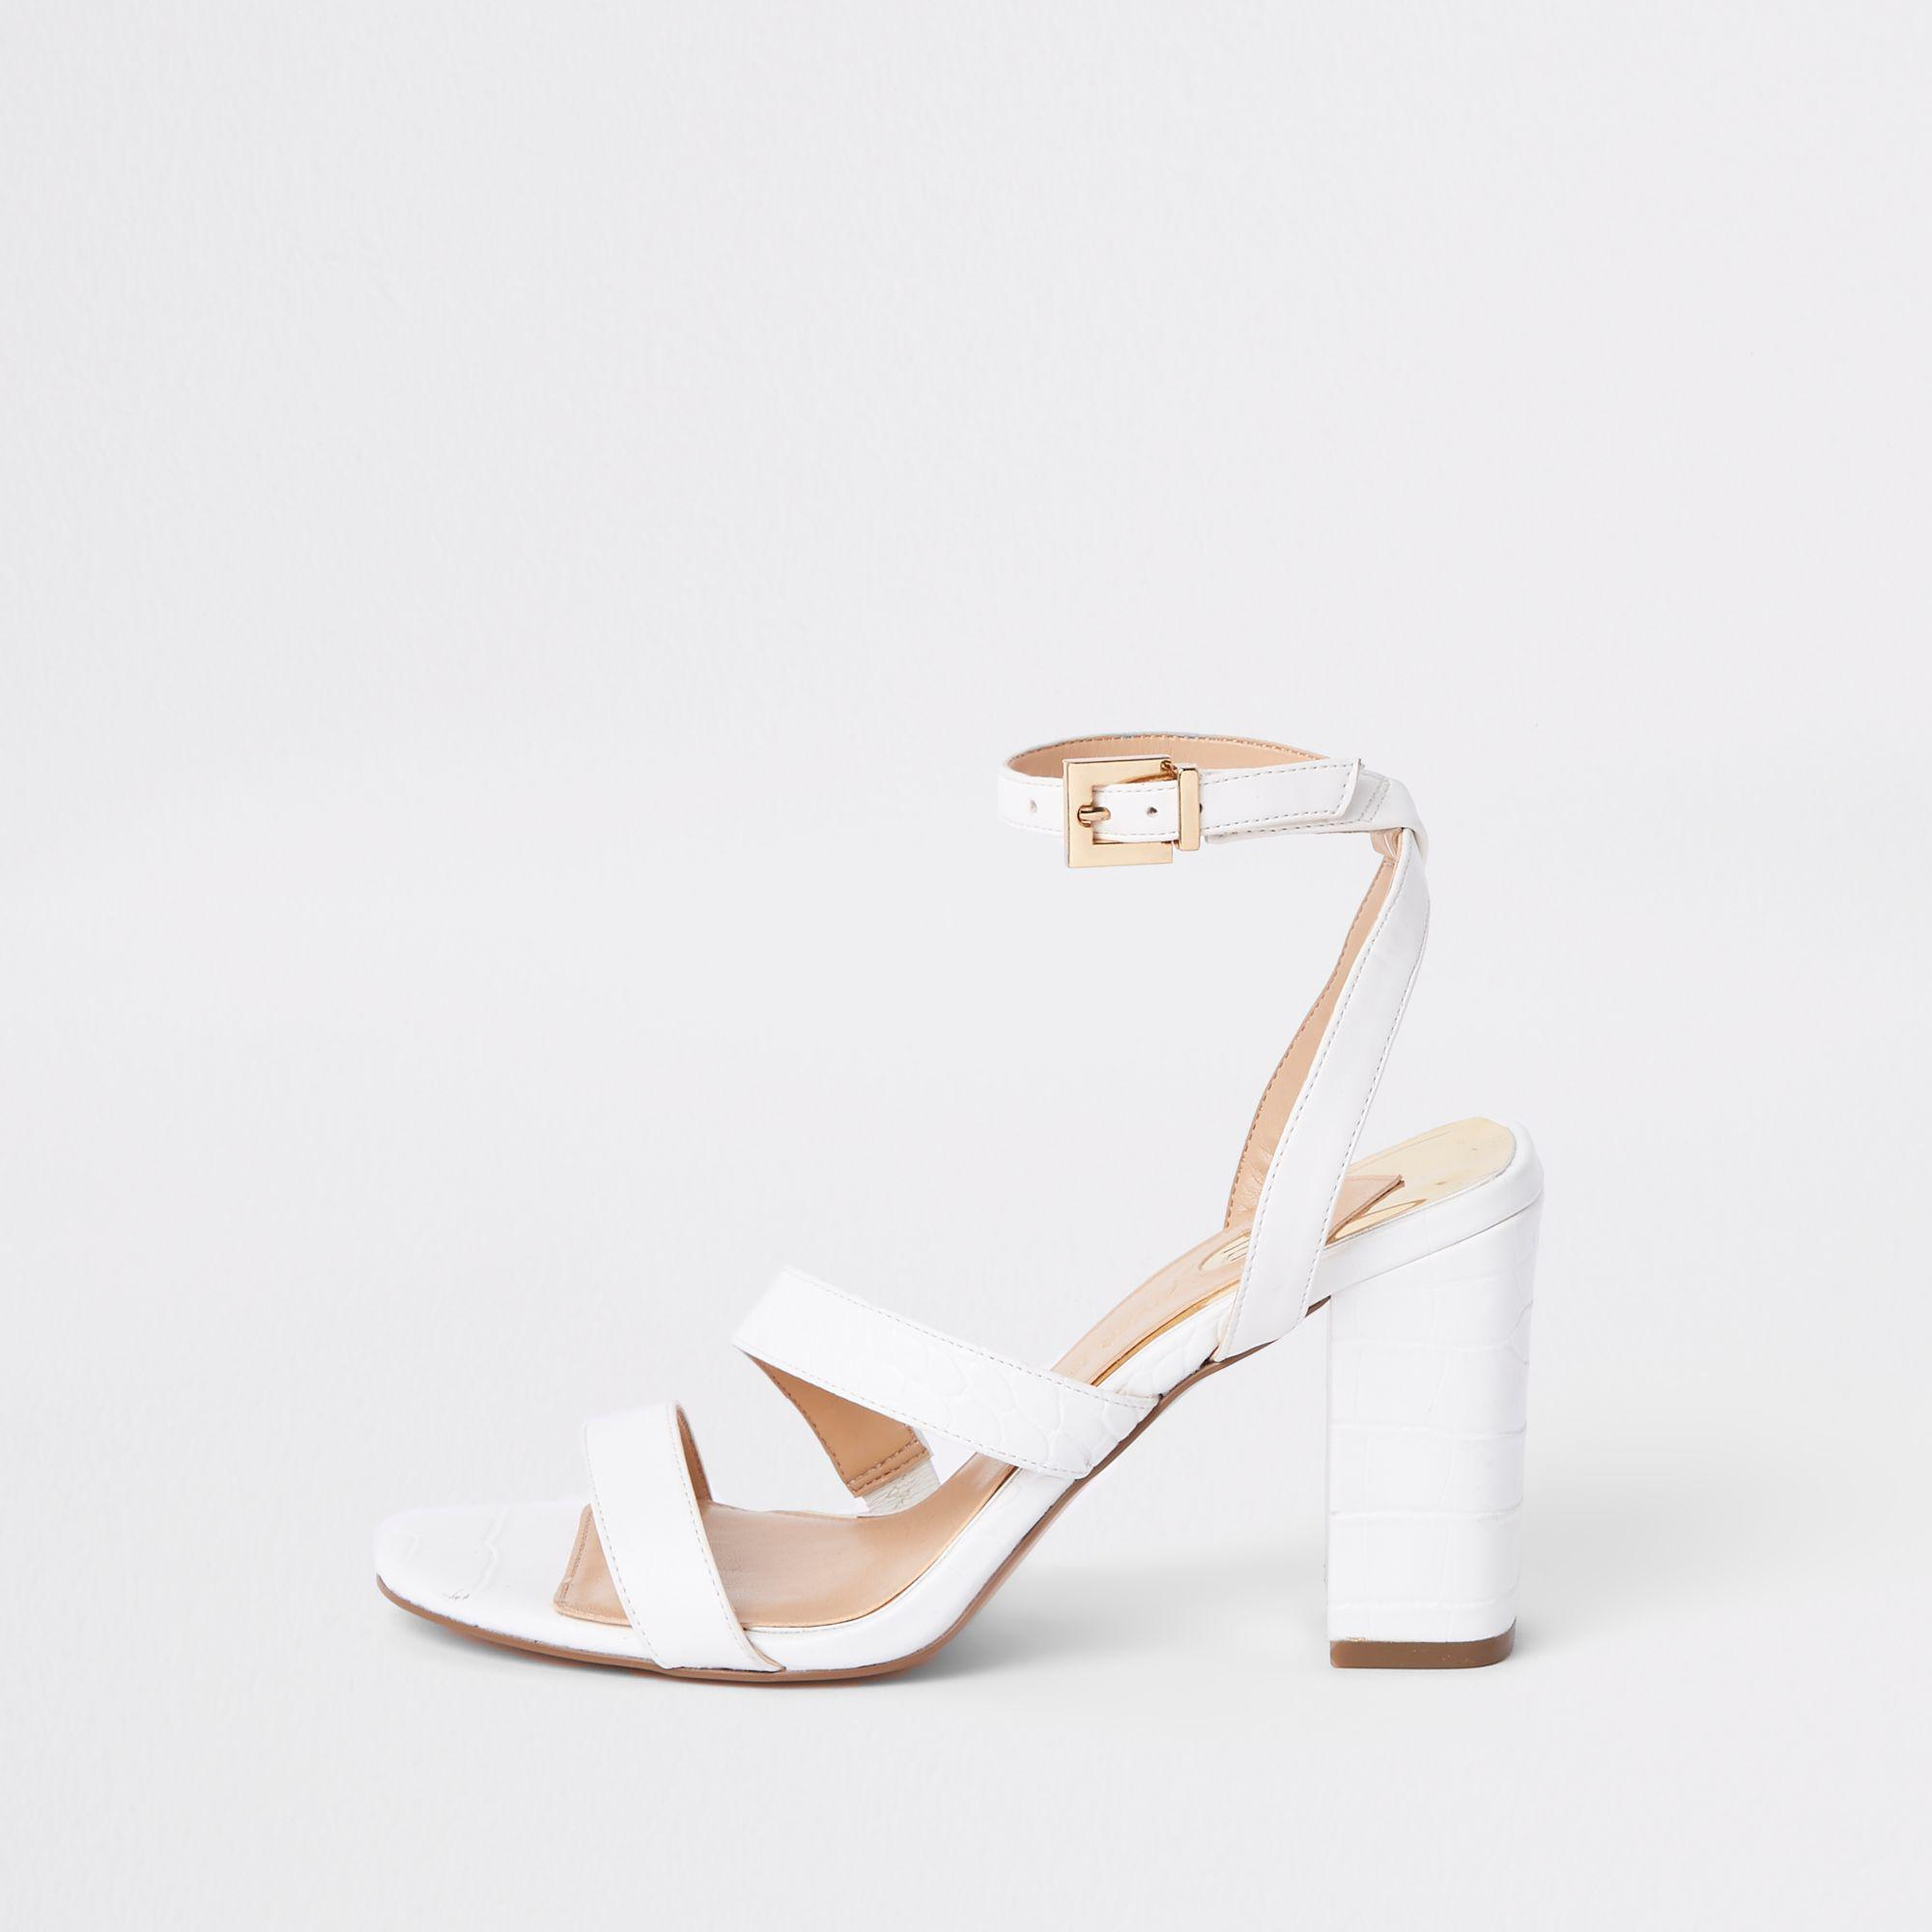 Asymmetric Strappy Block Heel Sandals